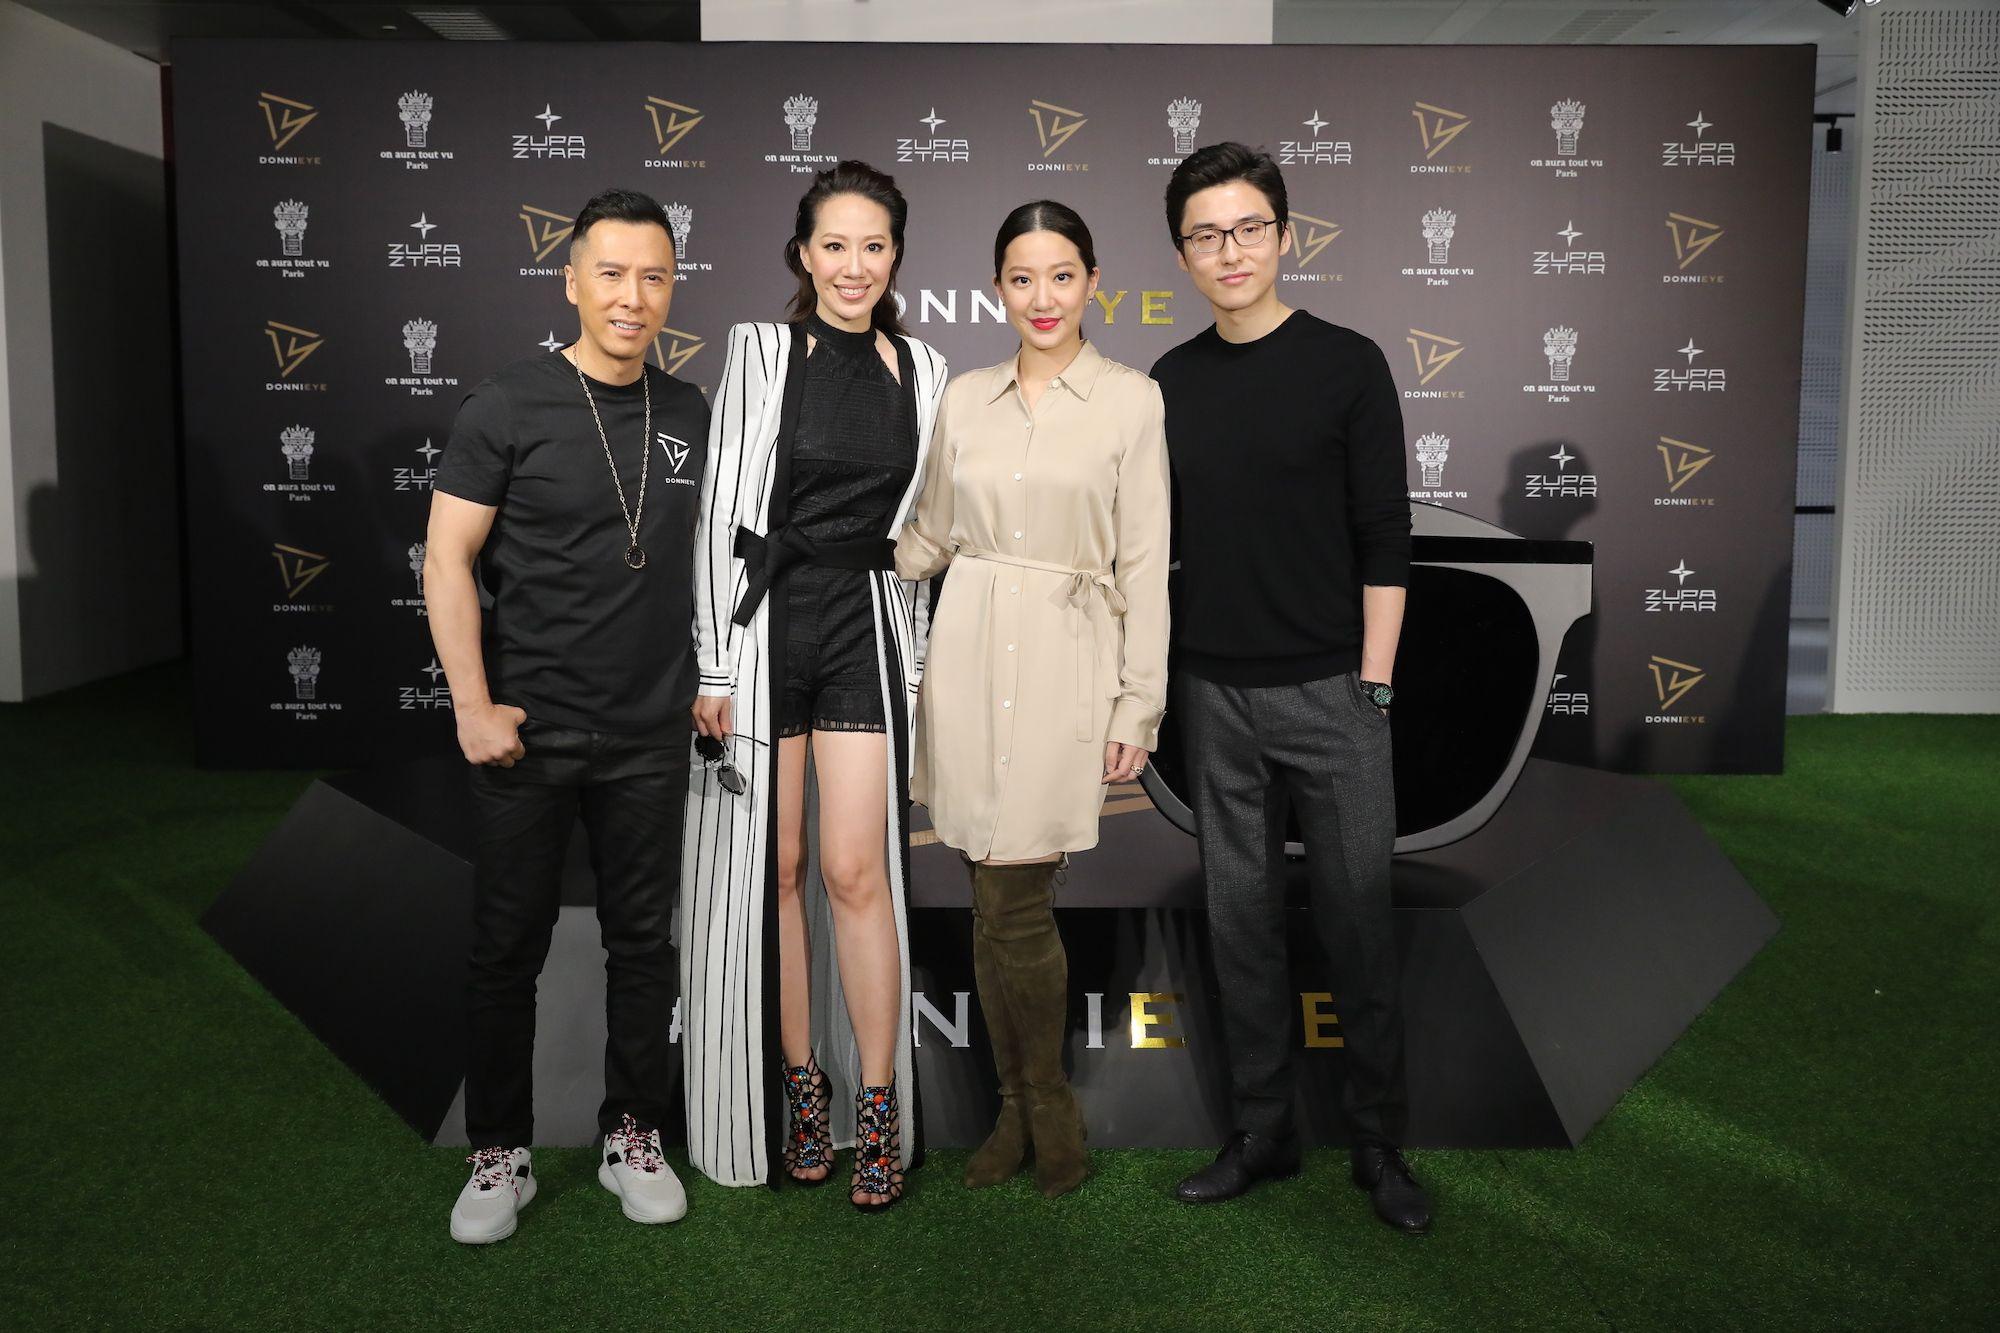 Donnie Yen, Cissy Wang, Irene Wang, Karson Choi